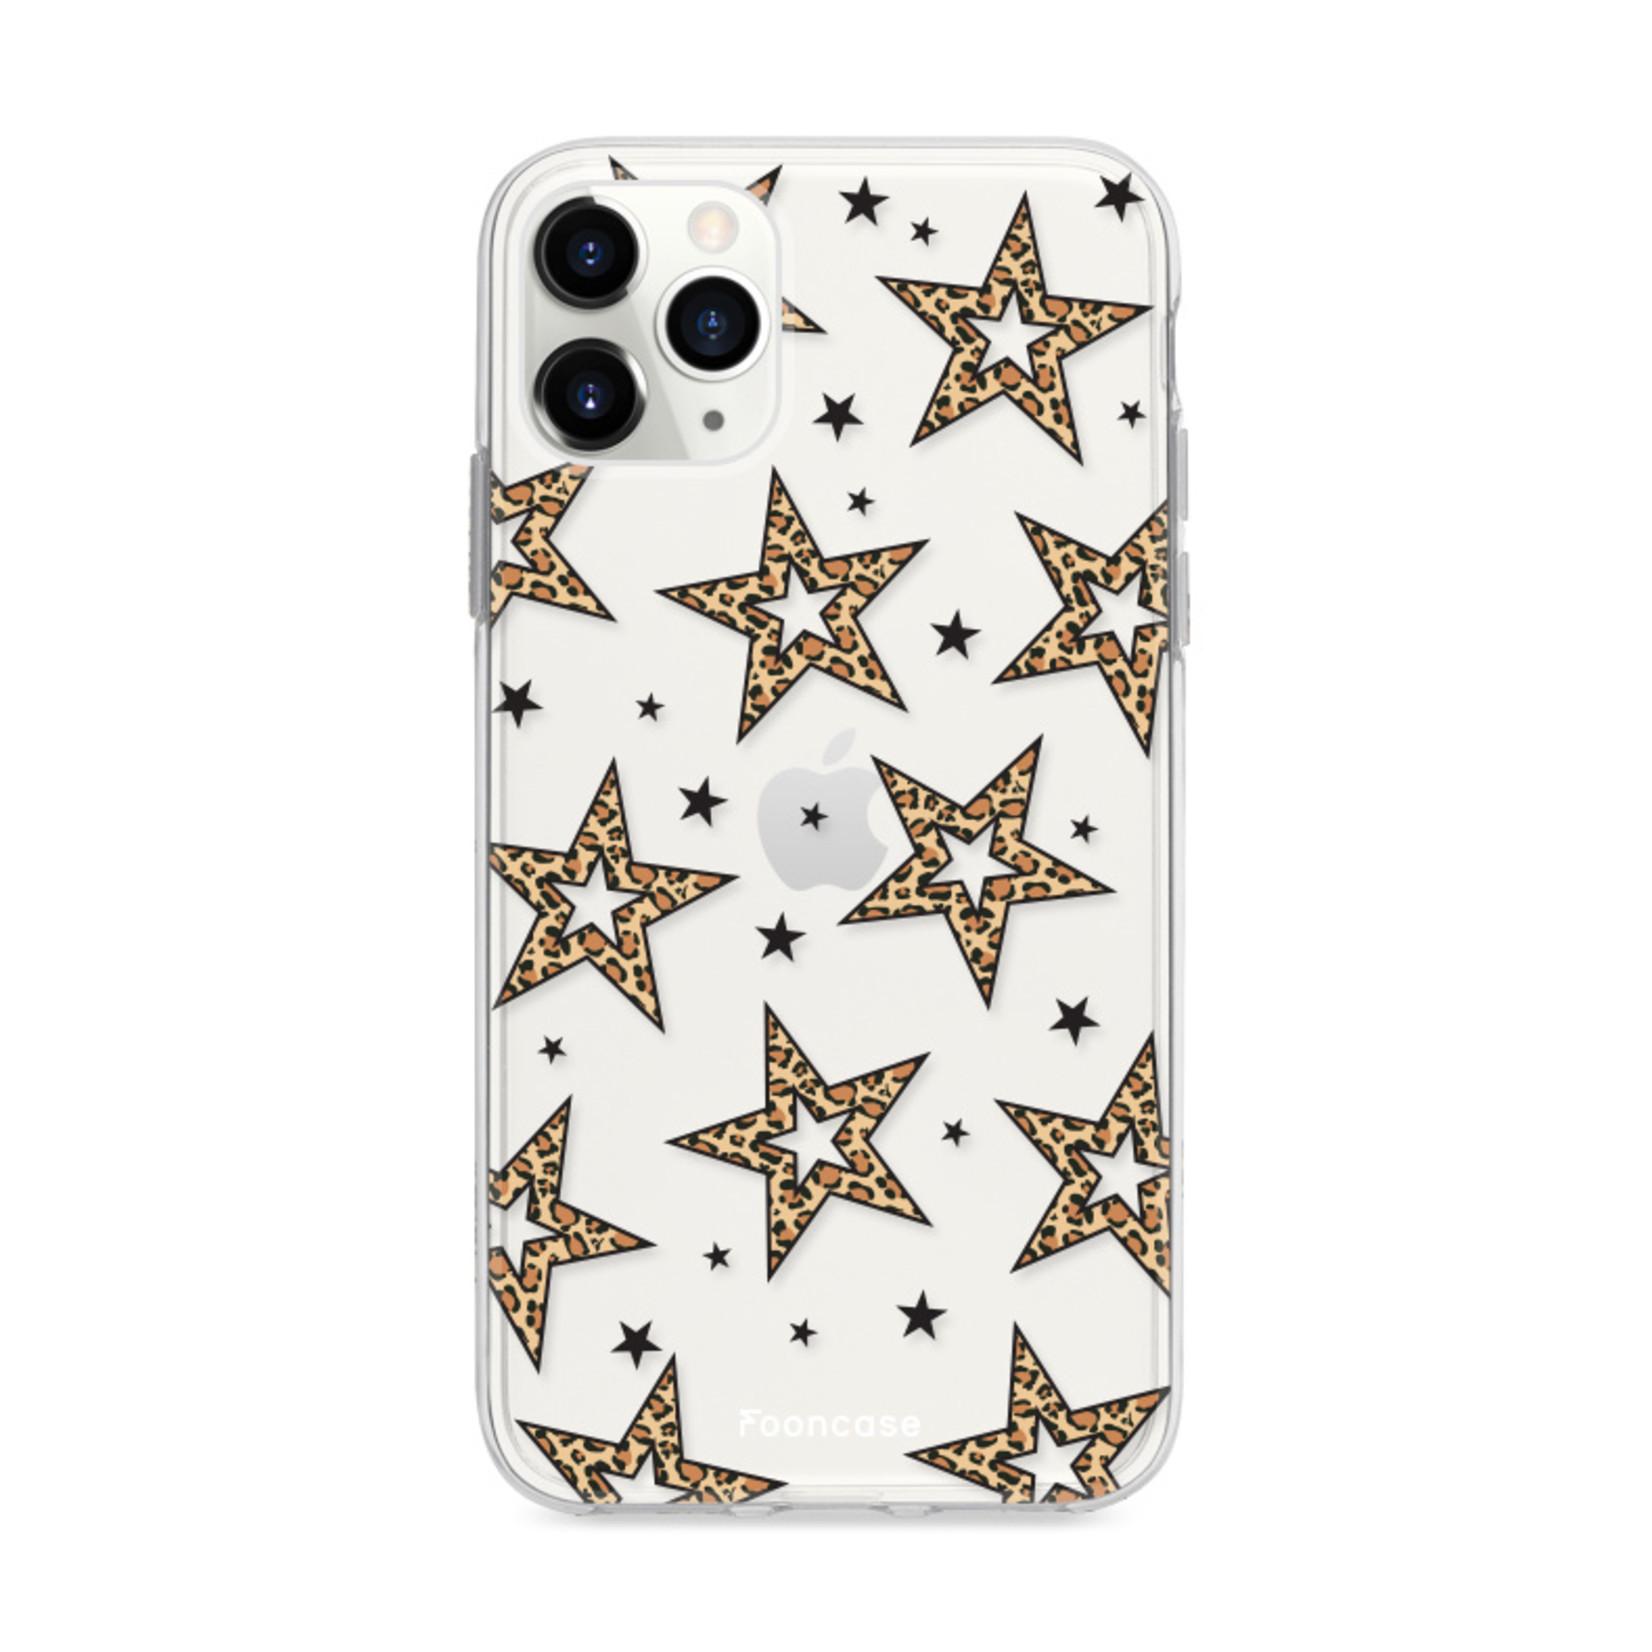 iPhone 12 Pro Max hoesje TPU Soft Case - Back Cover - Rebell Leopard Sterren Transparent